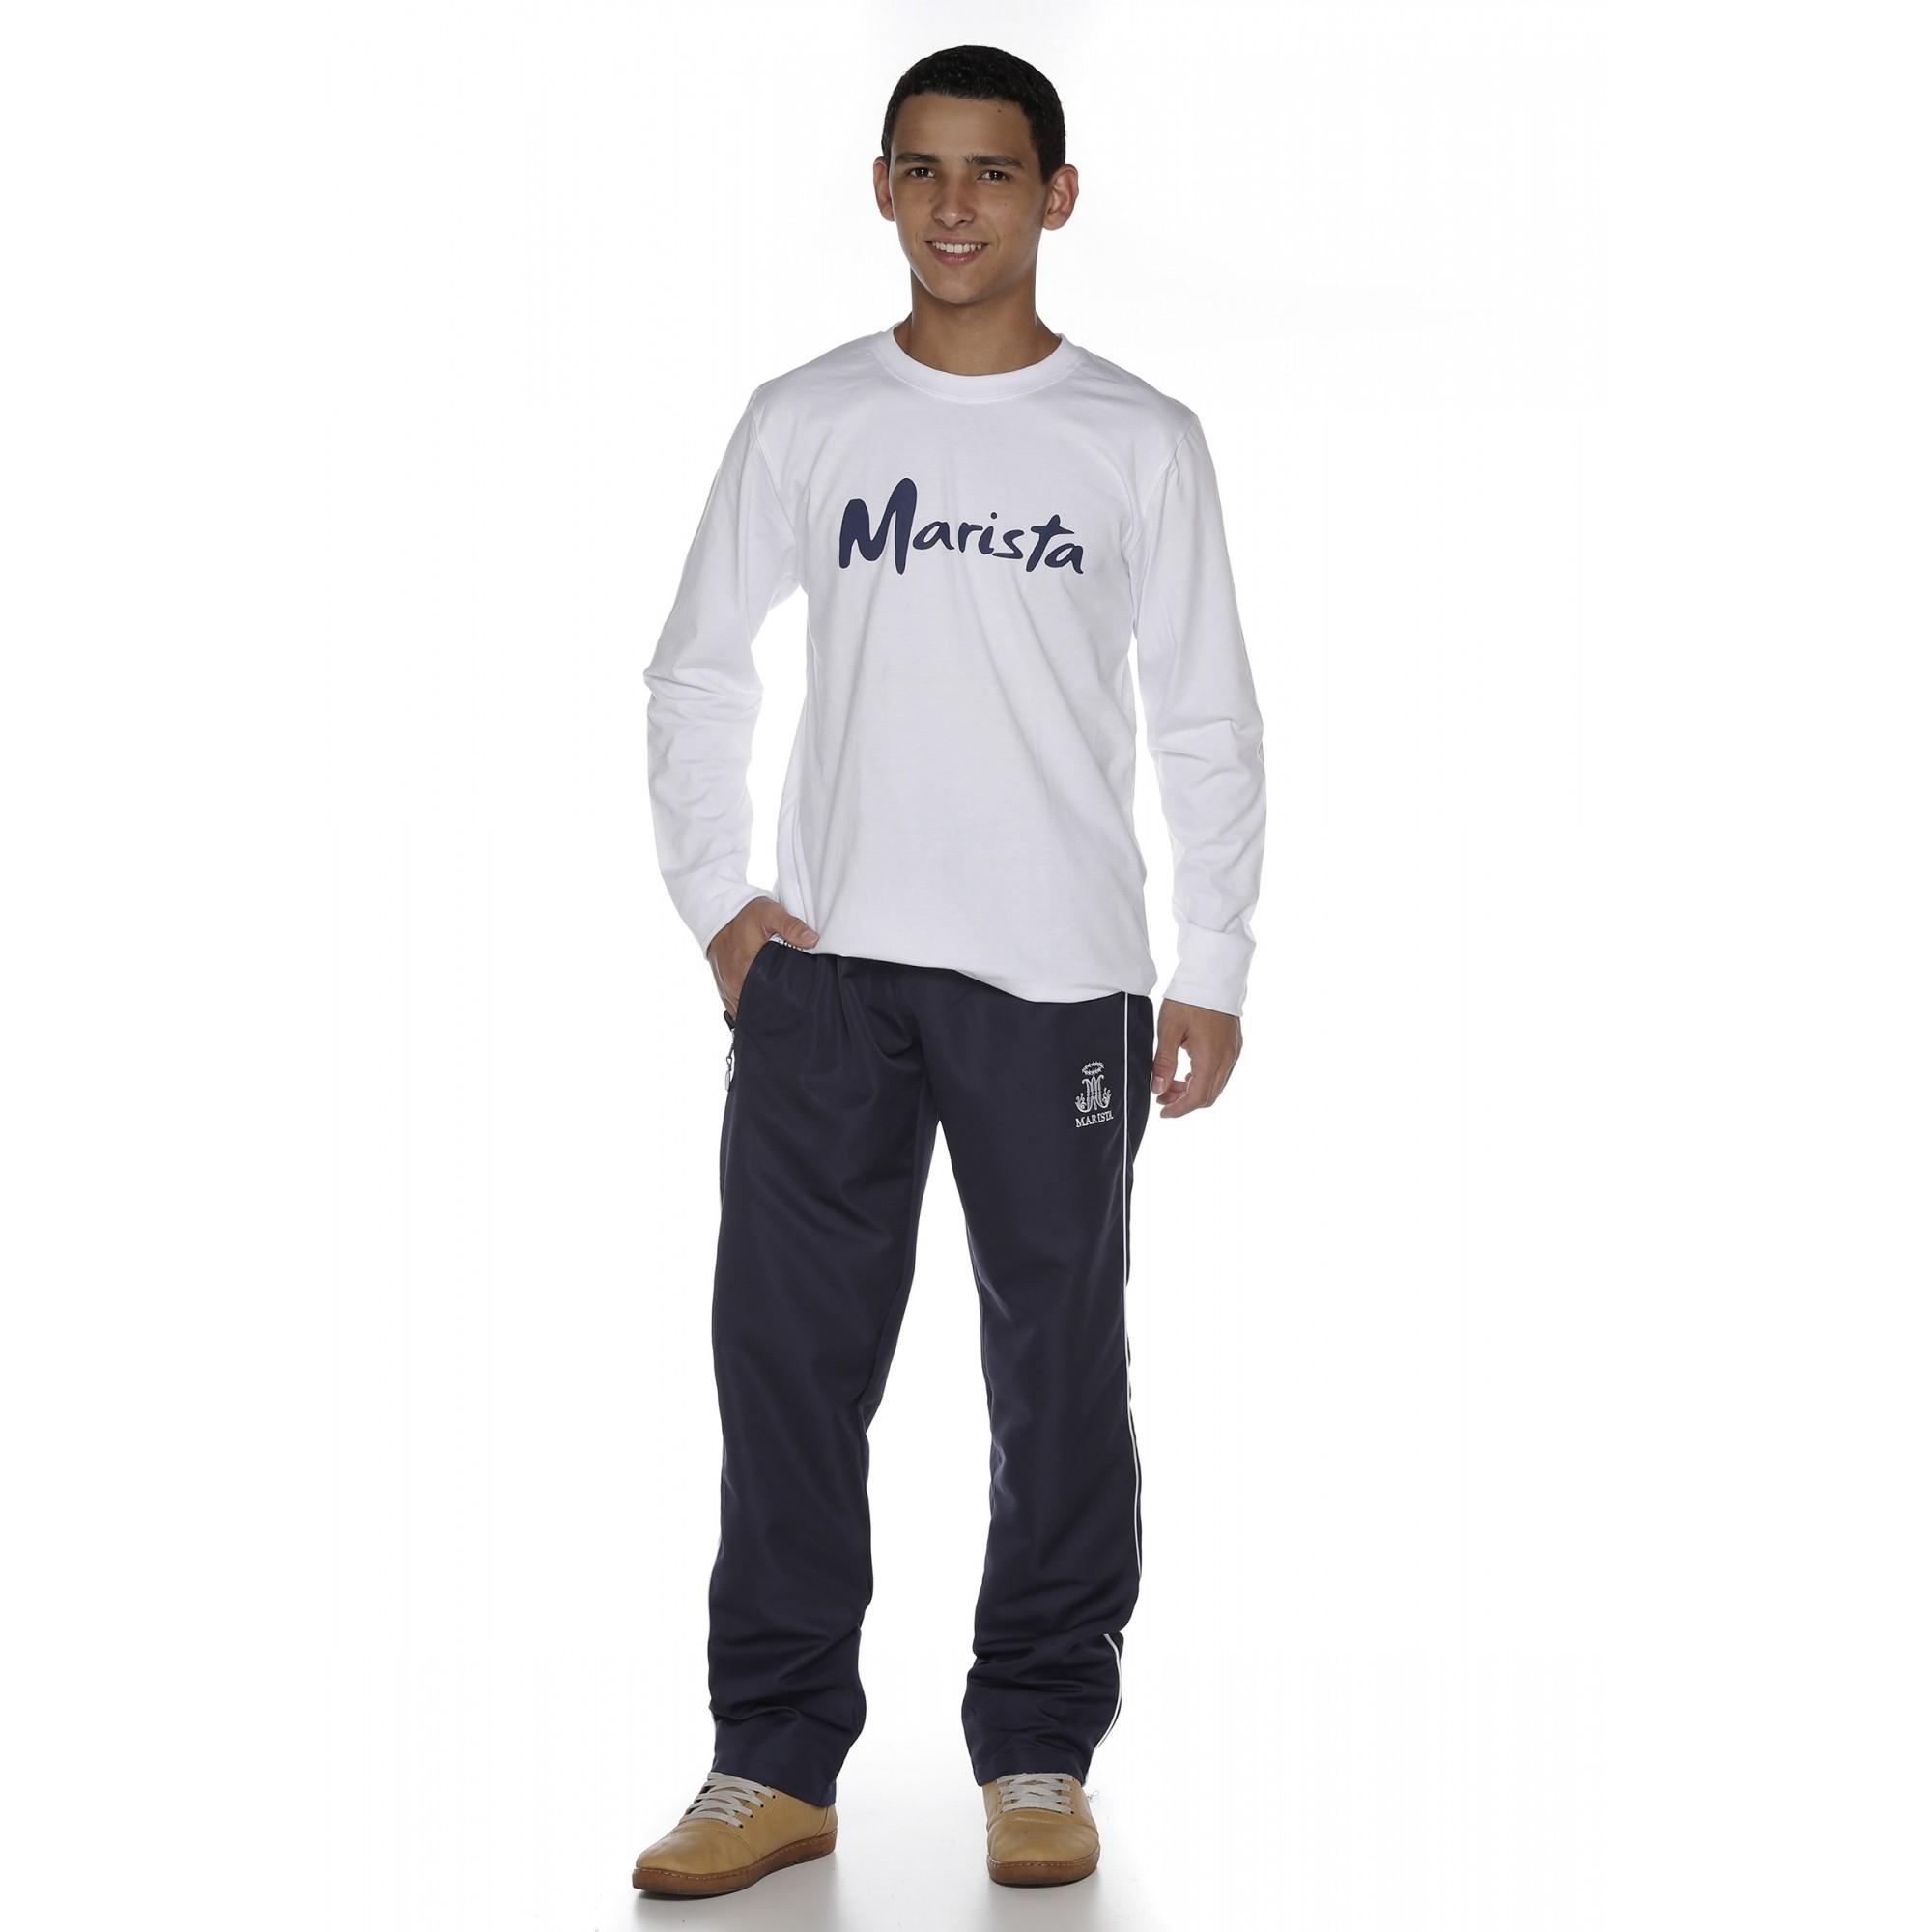 Camiseta Manga Longa Masculina Colégio Marista